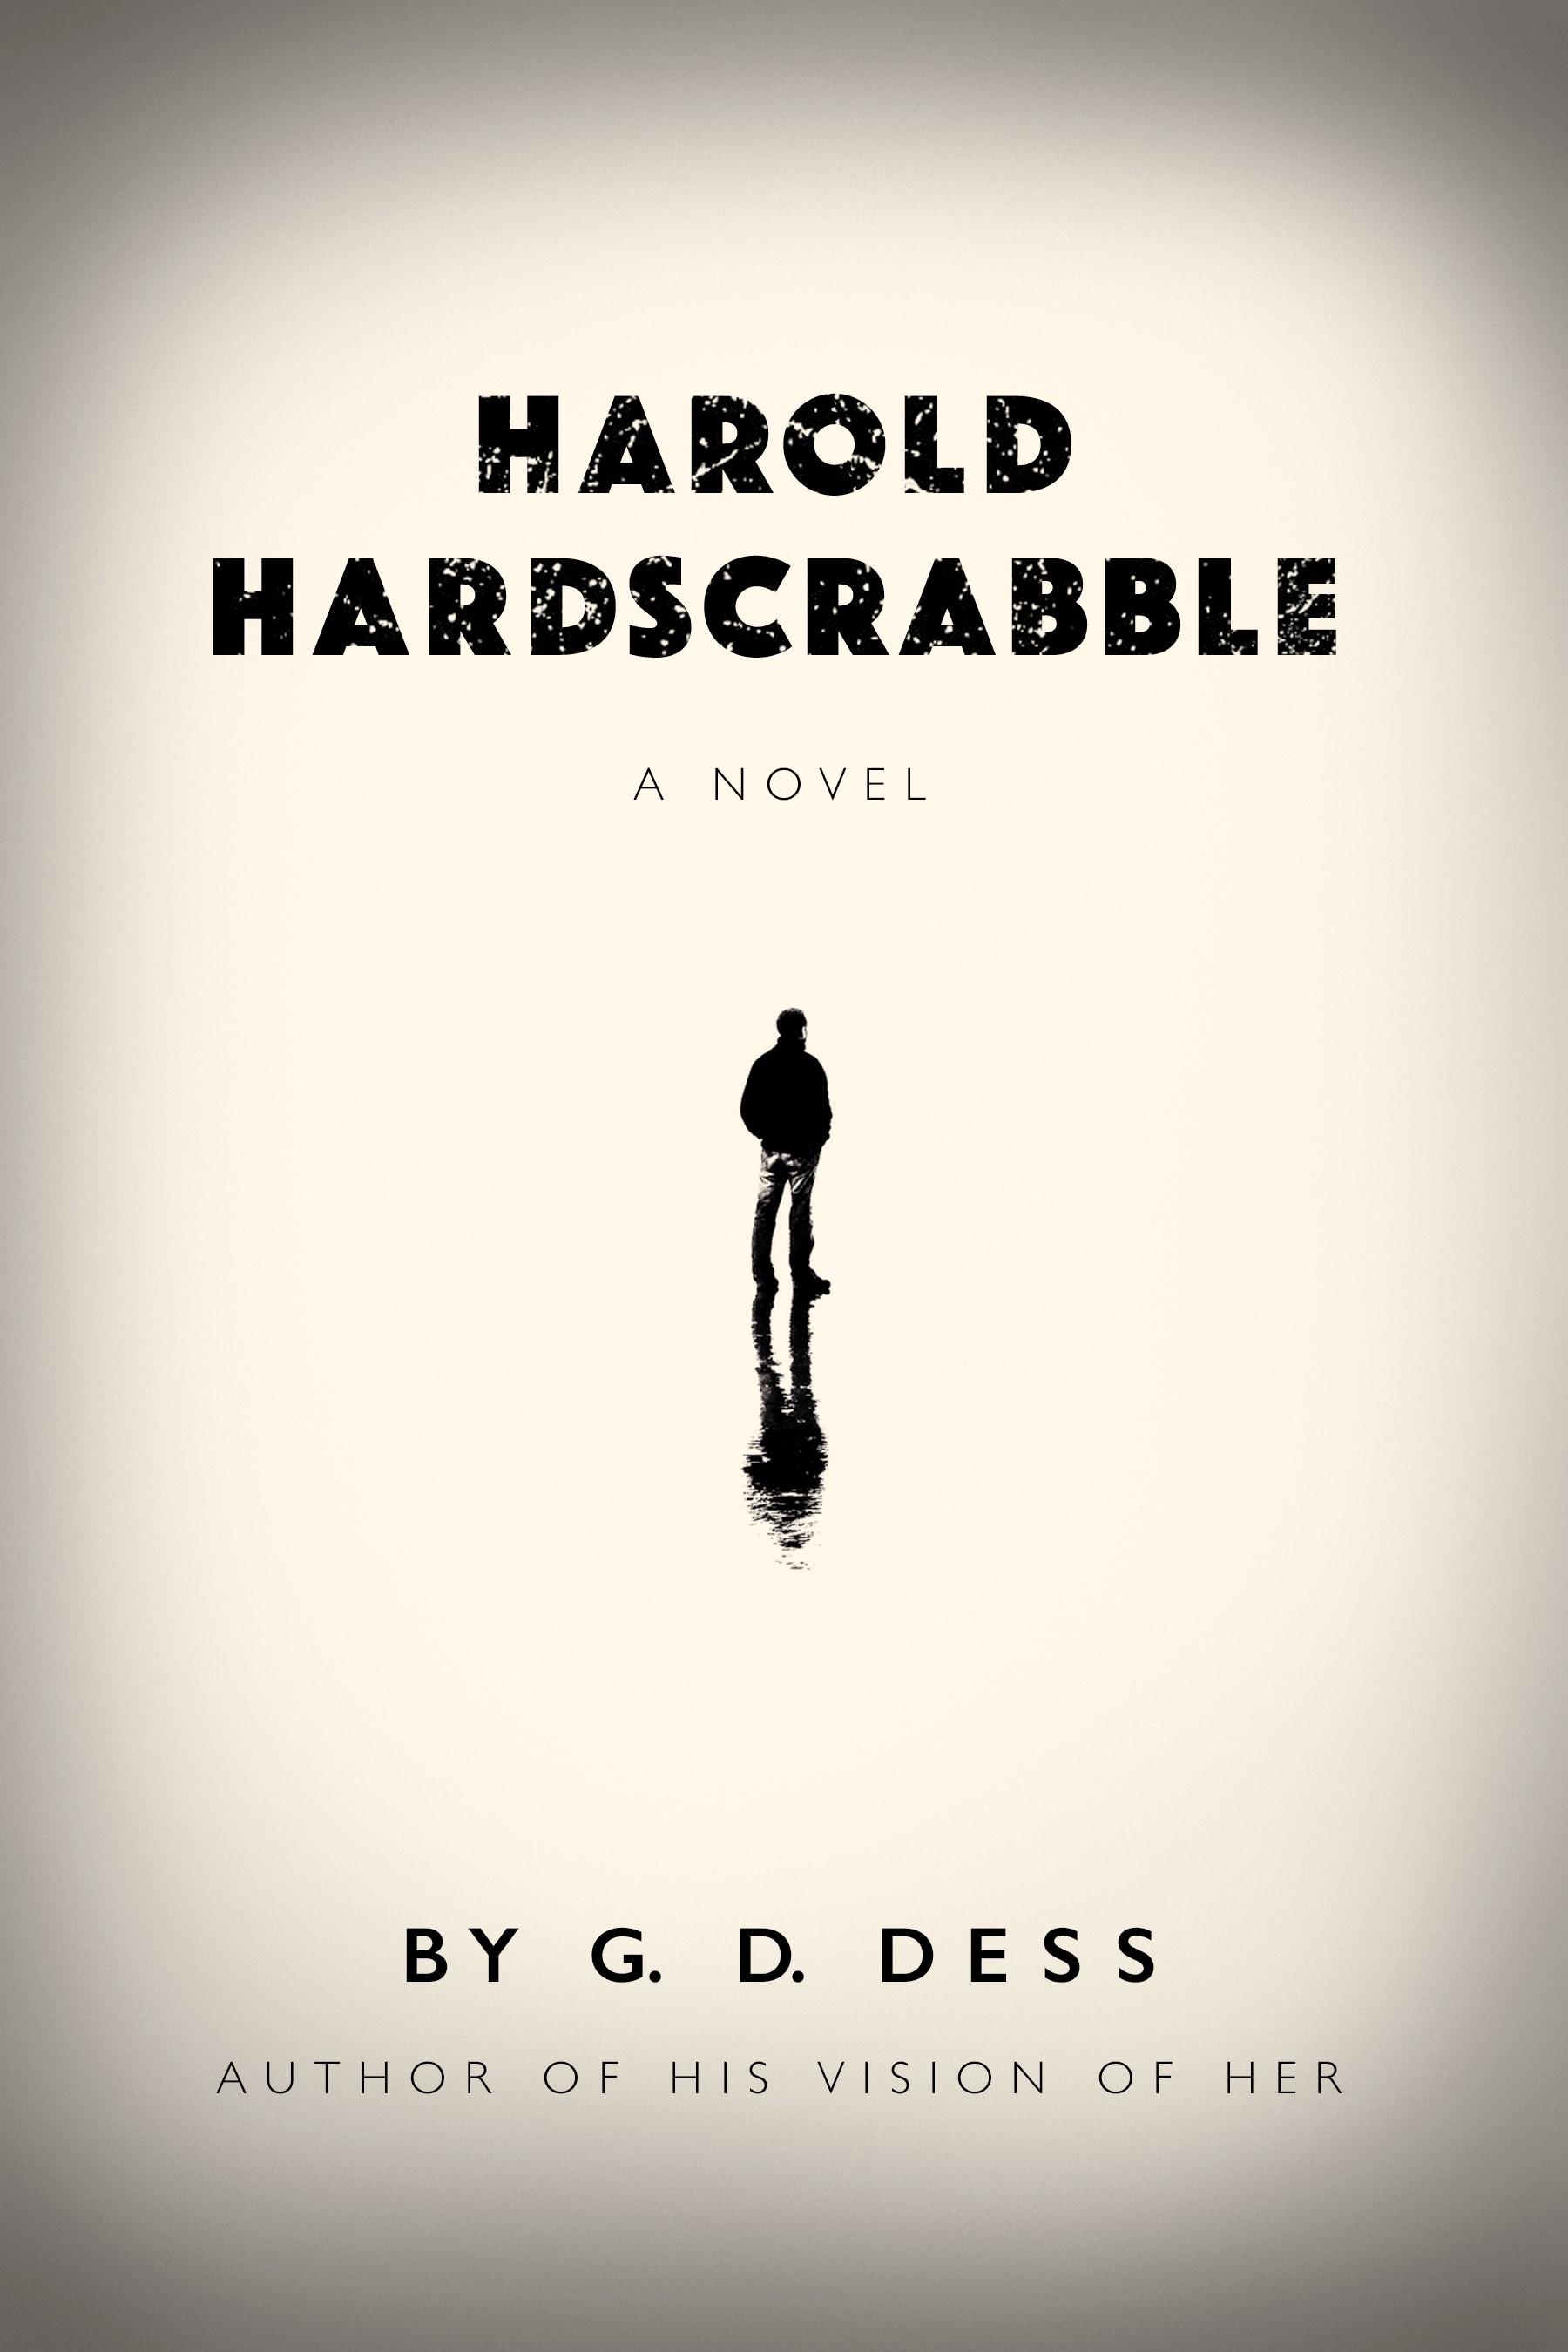 Harold Hardscrabble